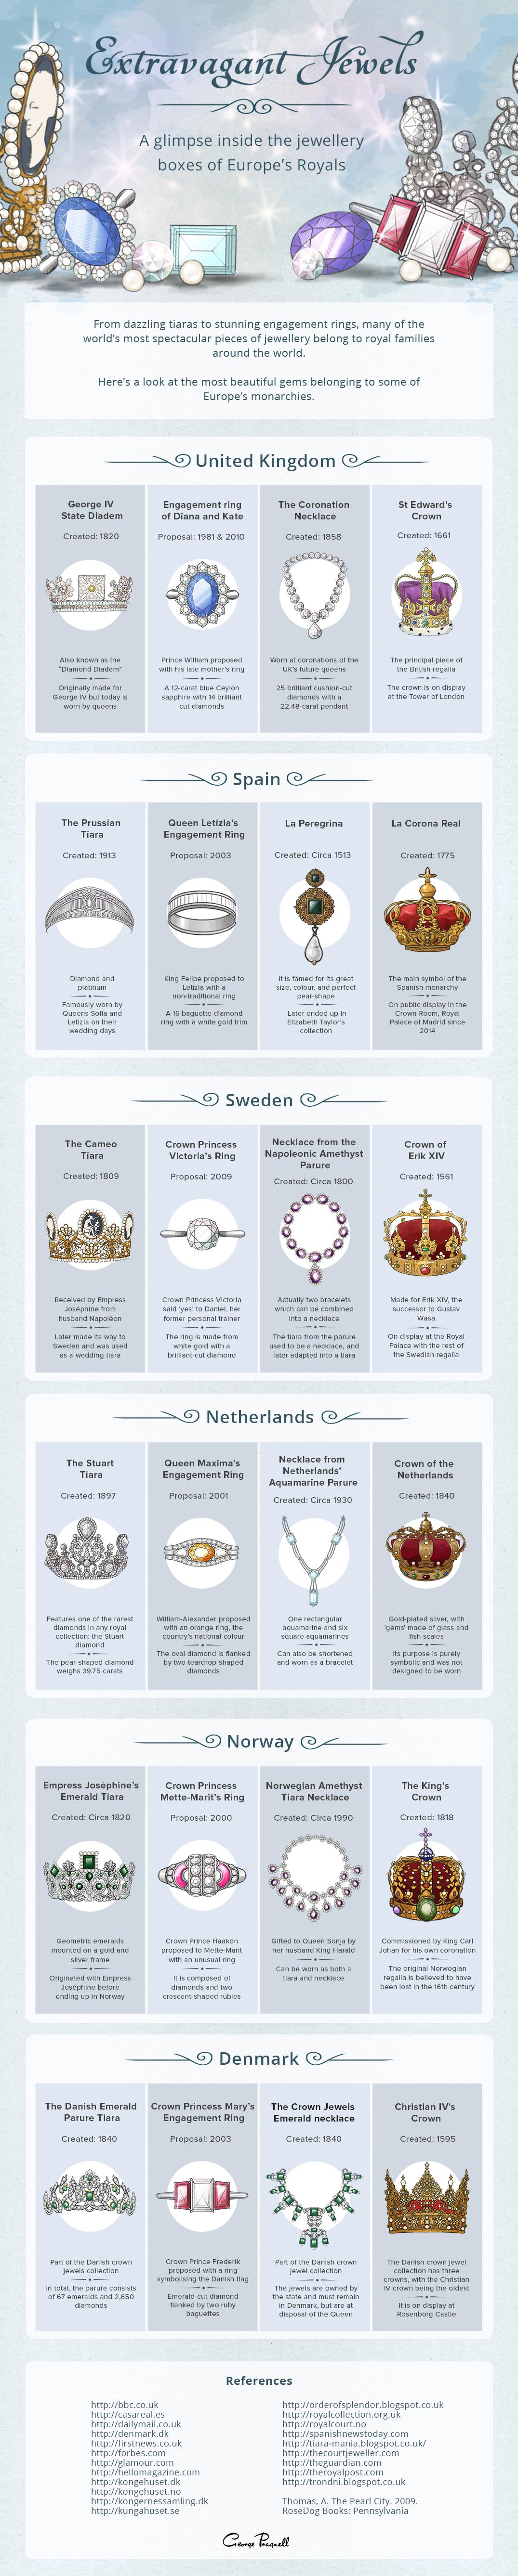 Extravagant Jewels